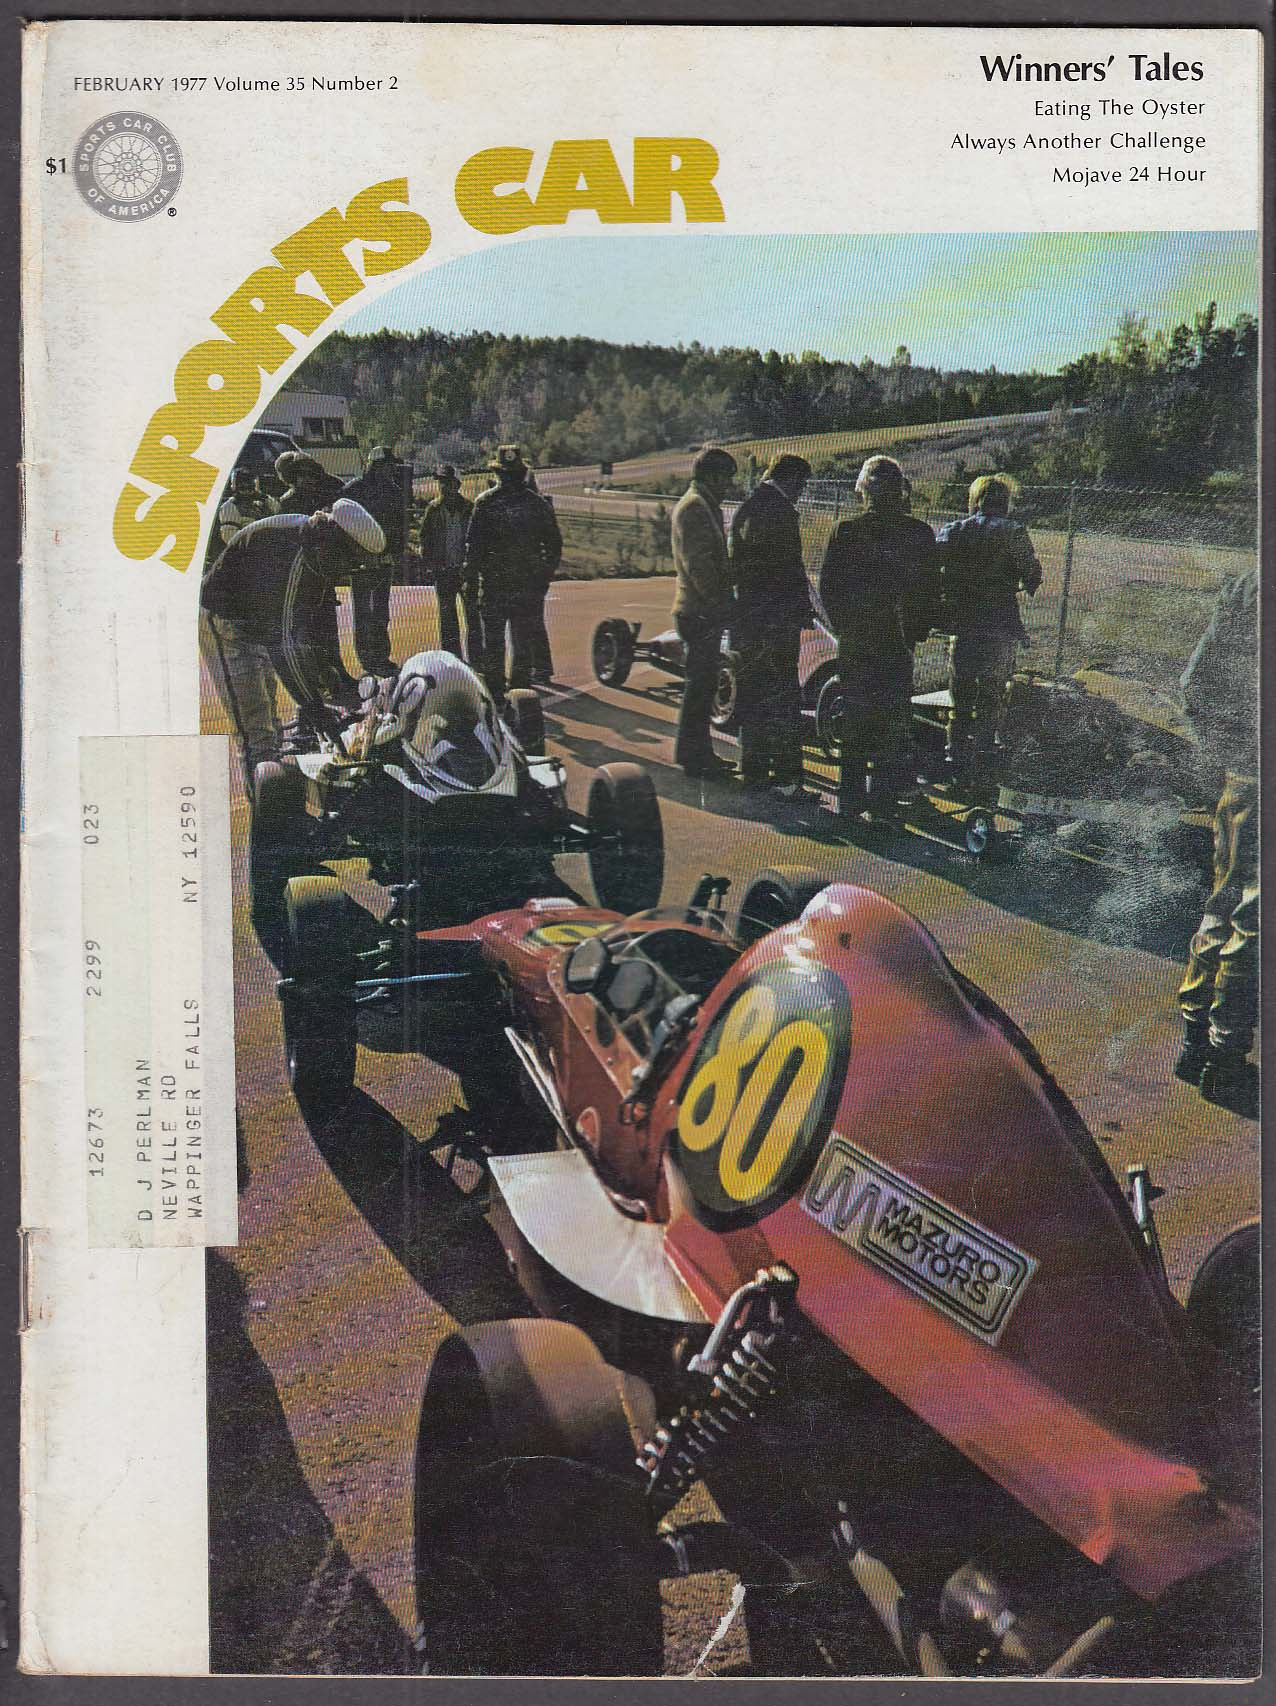 SCCA SPORTS CAR Emergency & Motor Race Medicine Symposium Silicone Brakes 2 1977